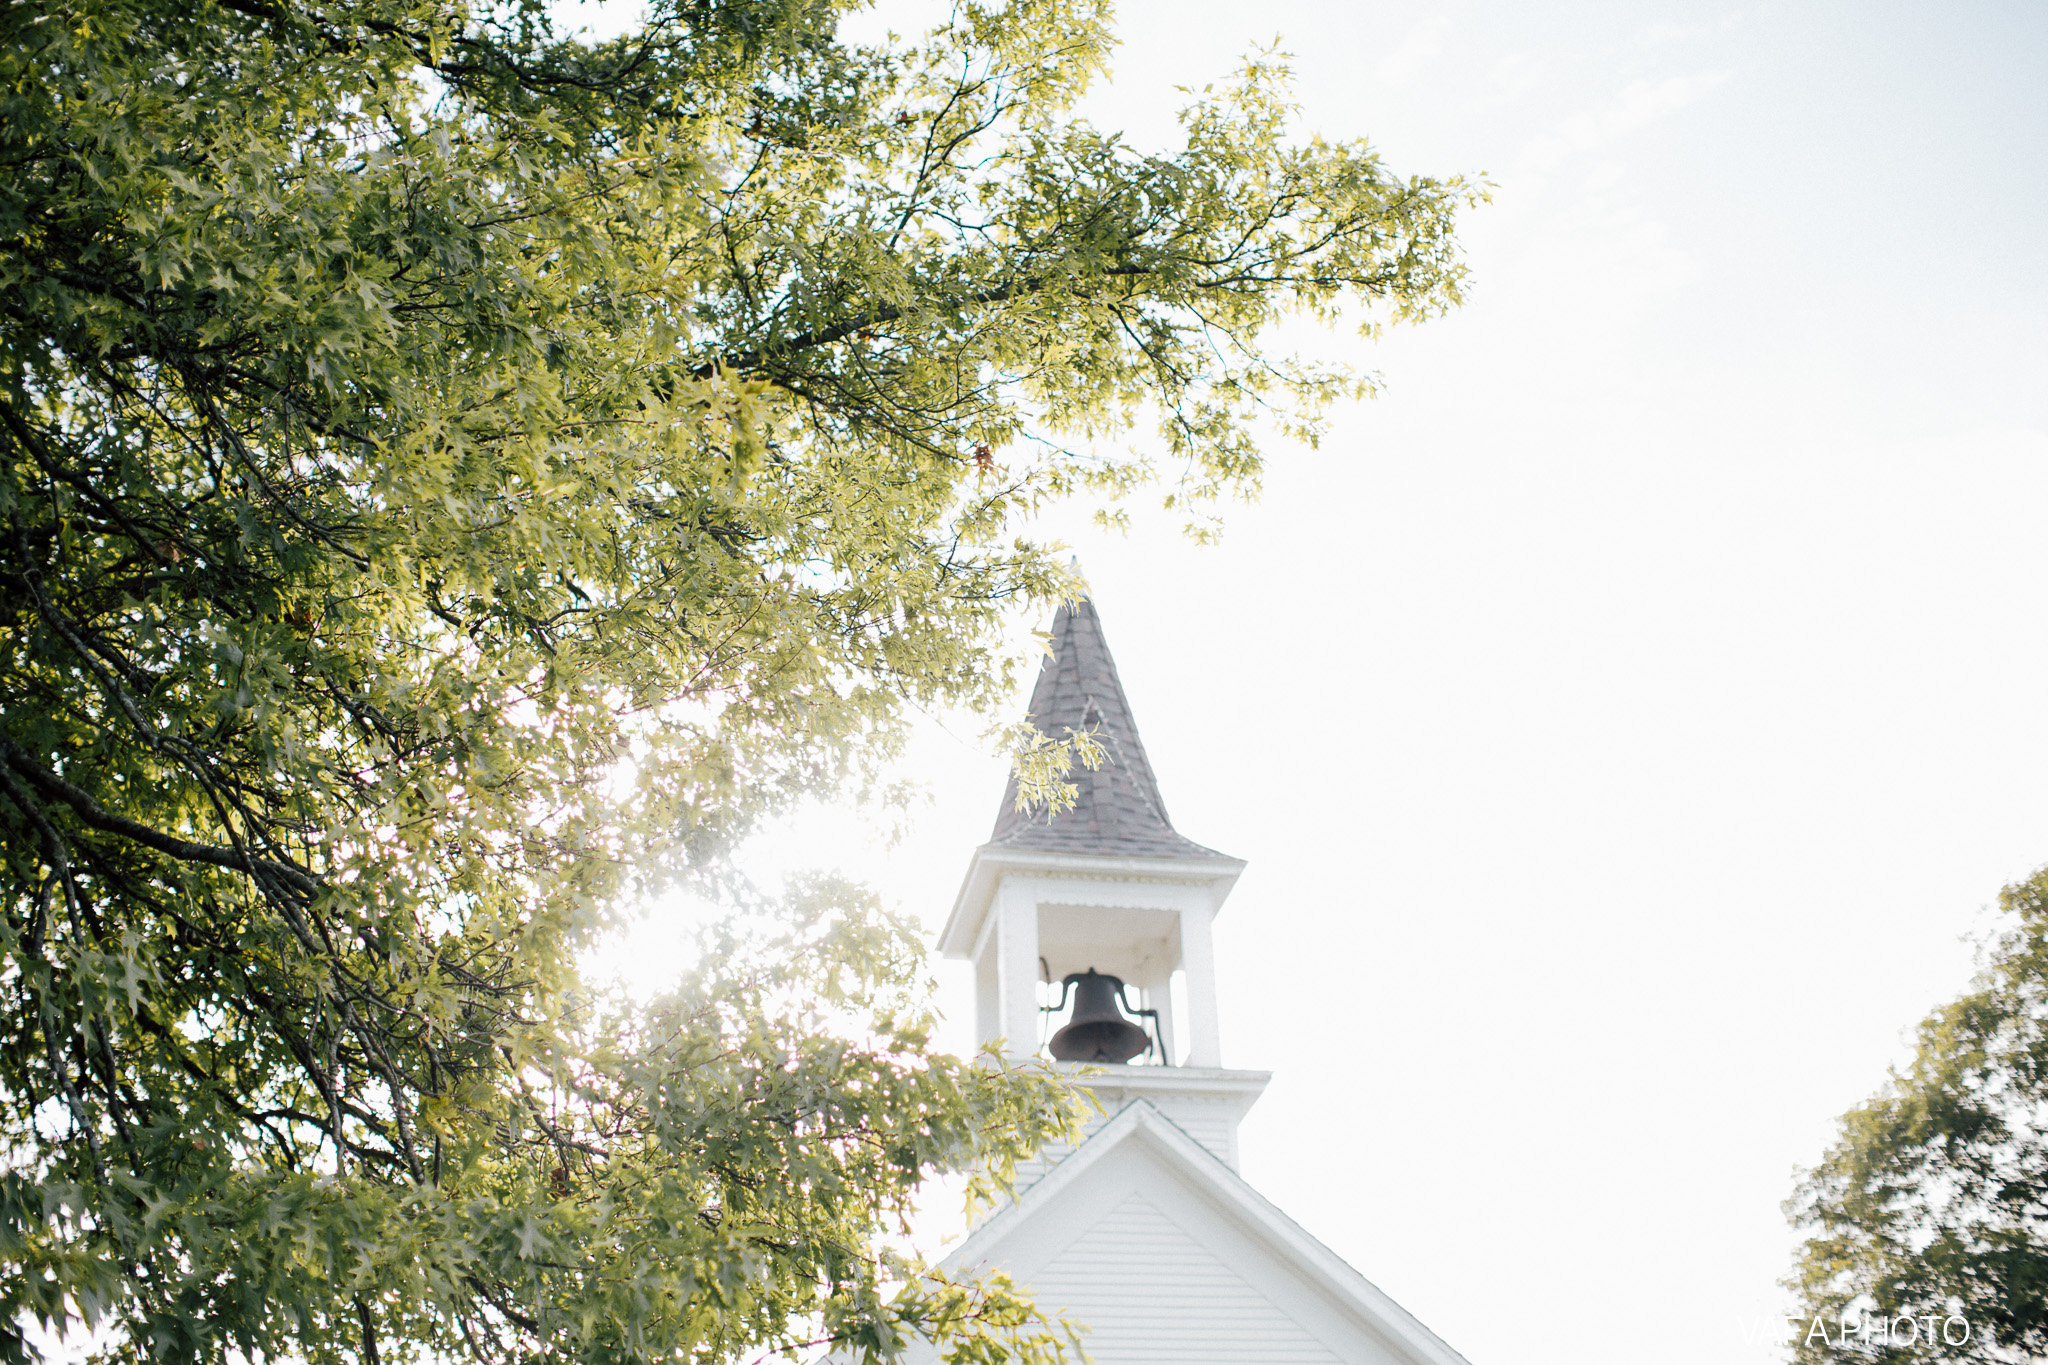 The-Felt-Estate-Wedding-Kailie-David-Vafa-Photo-225.jpg